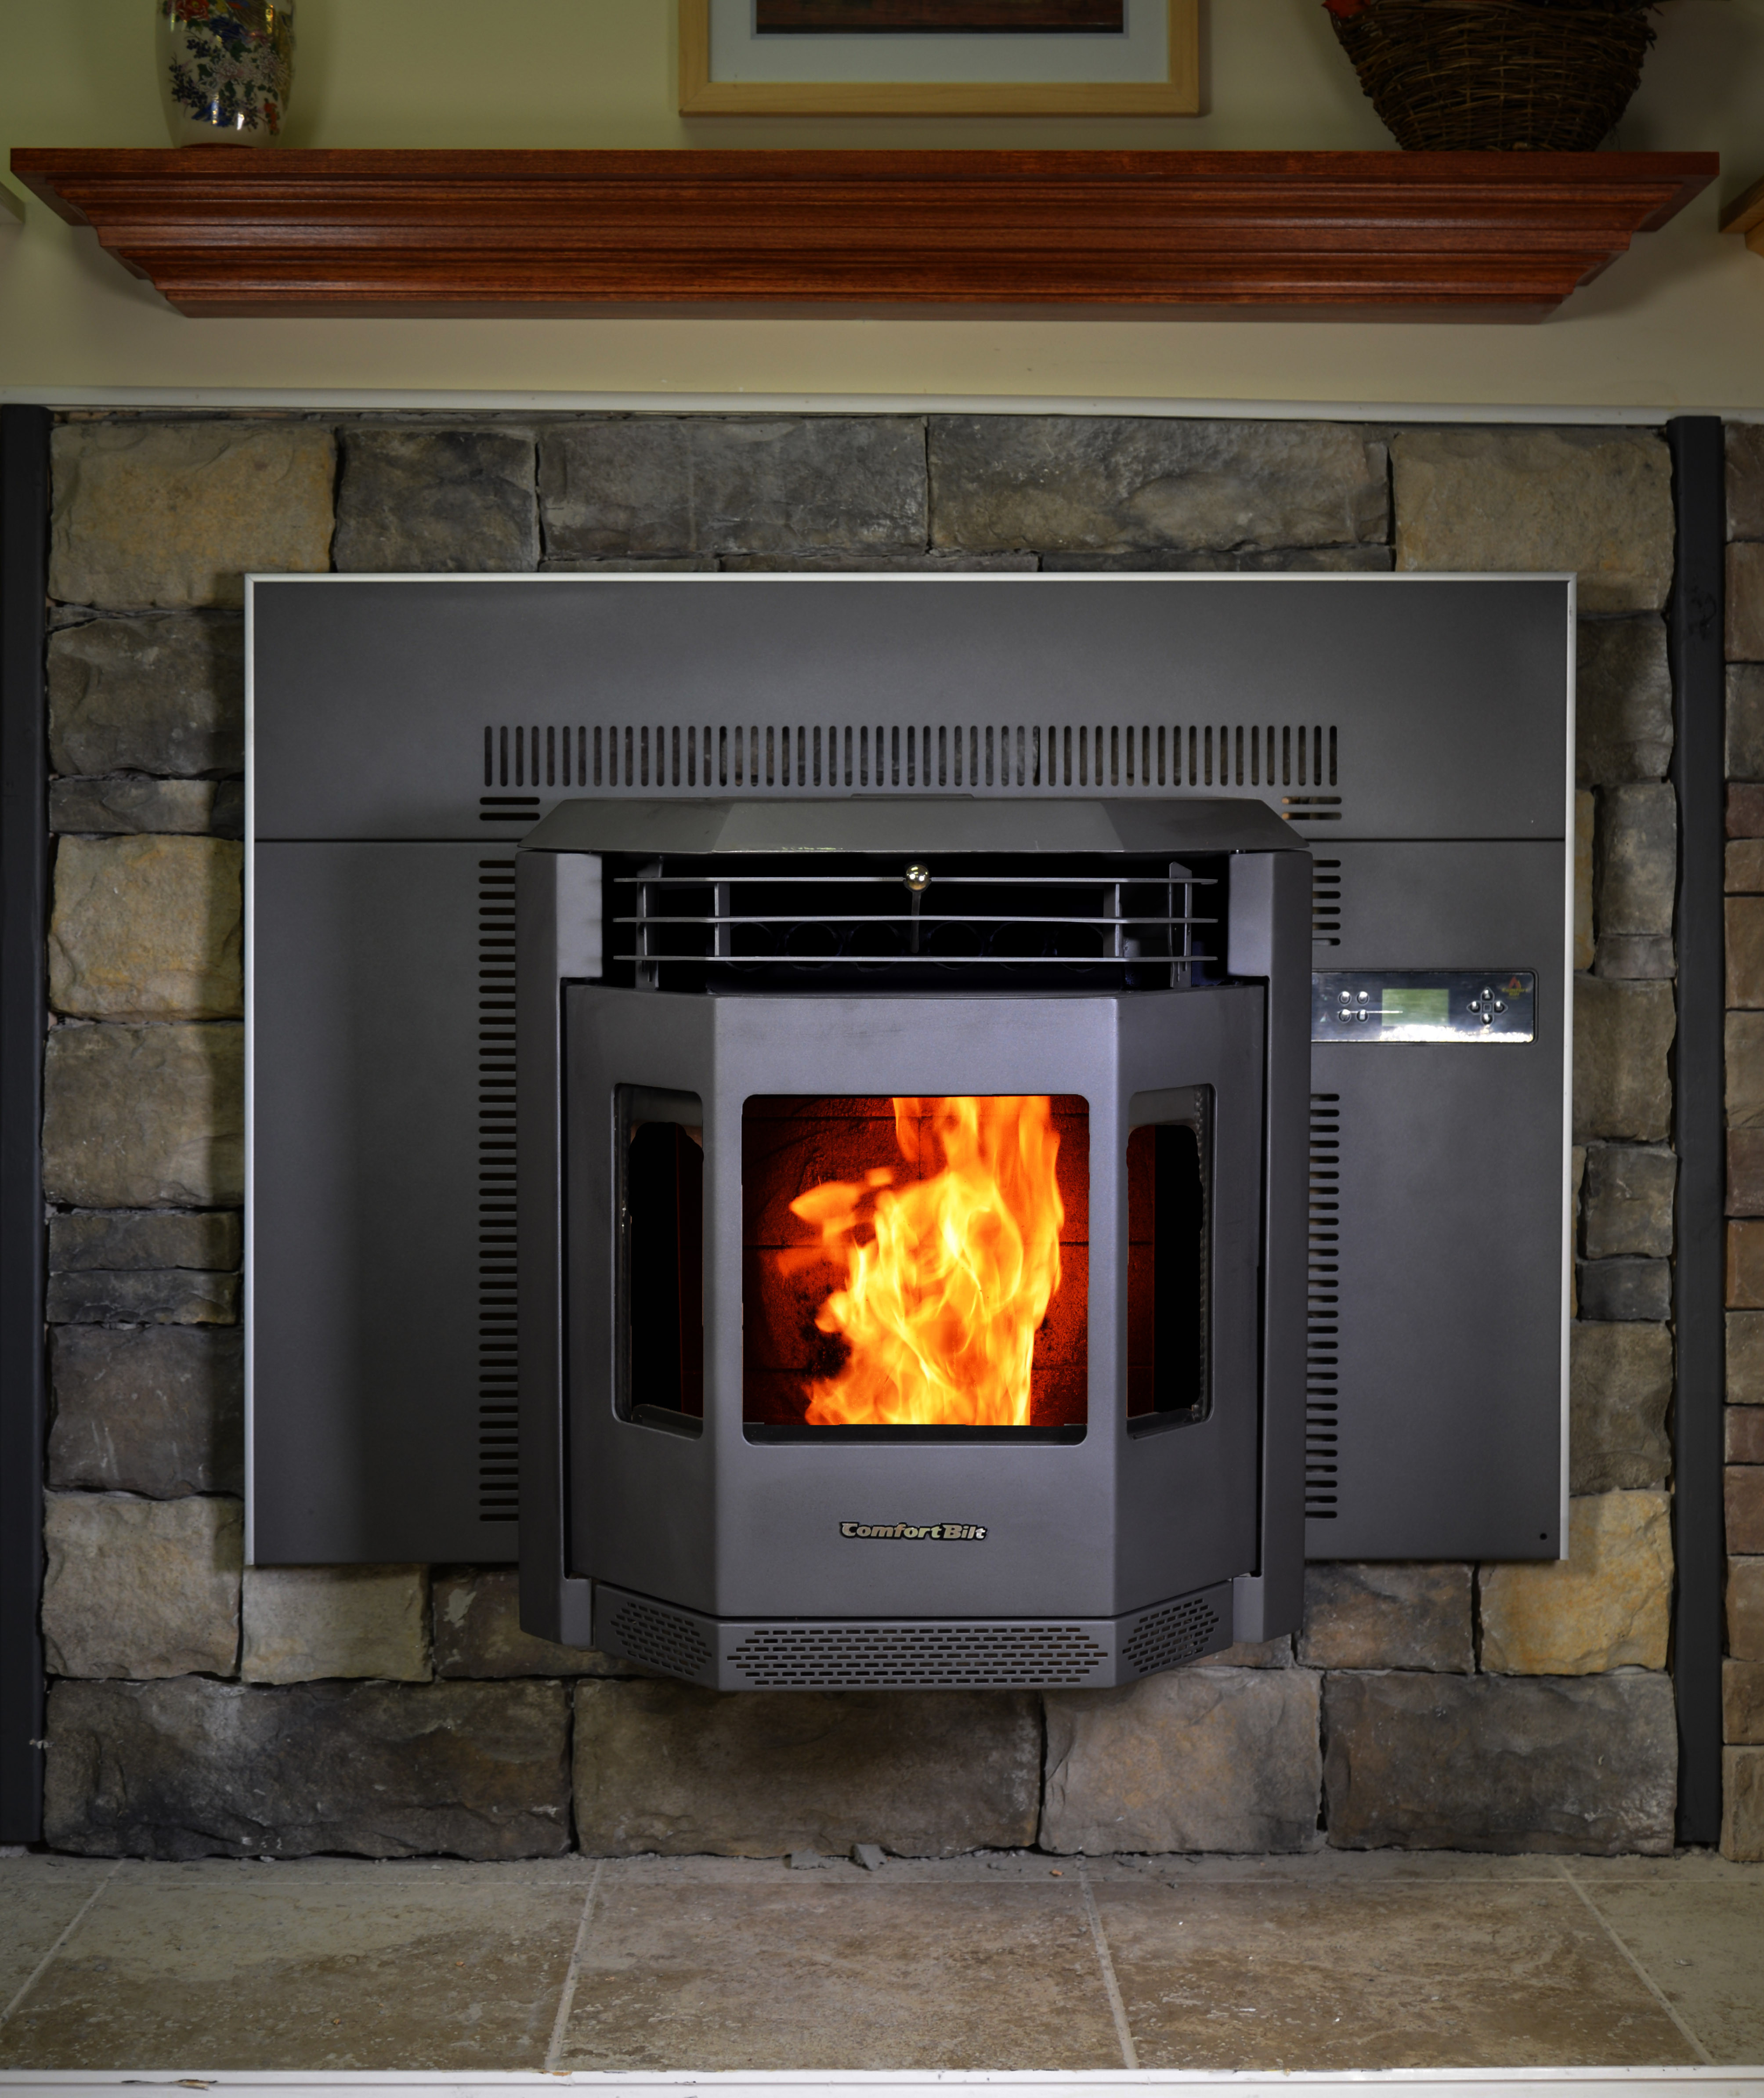 comfortbilt pellet stoves building quality comforts